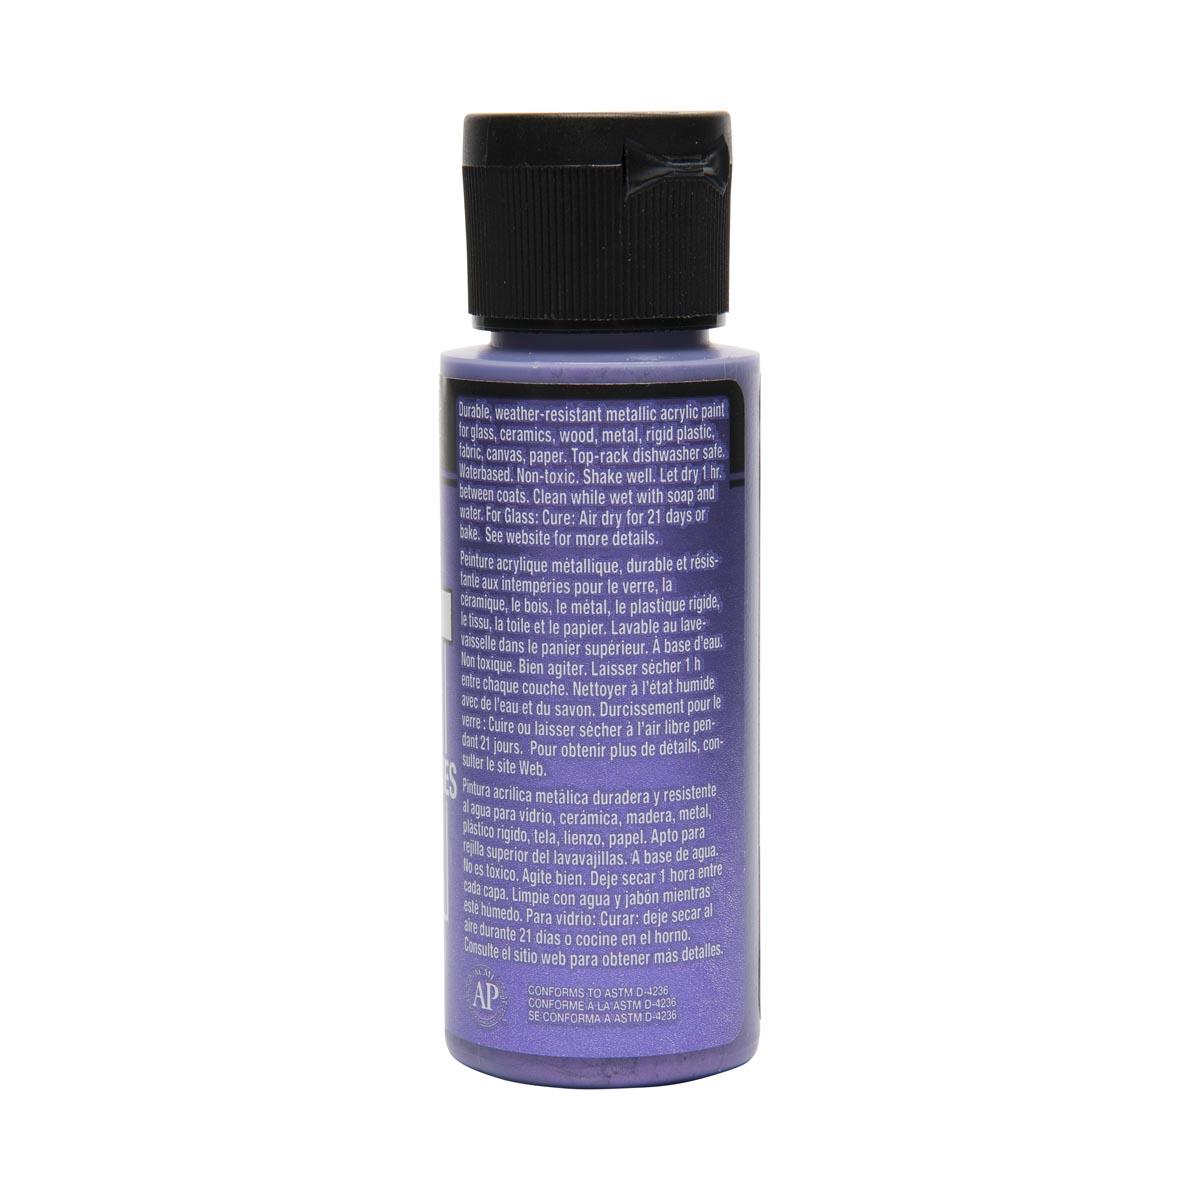 FolkArt ® Multi-Surface Metallic Acrylic Paints - Tanzanite, 2 oz.